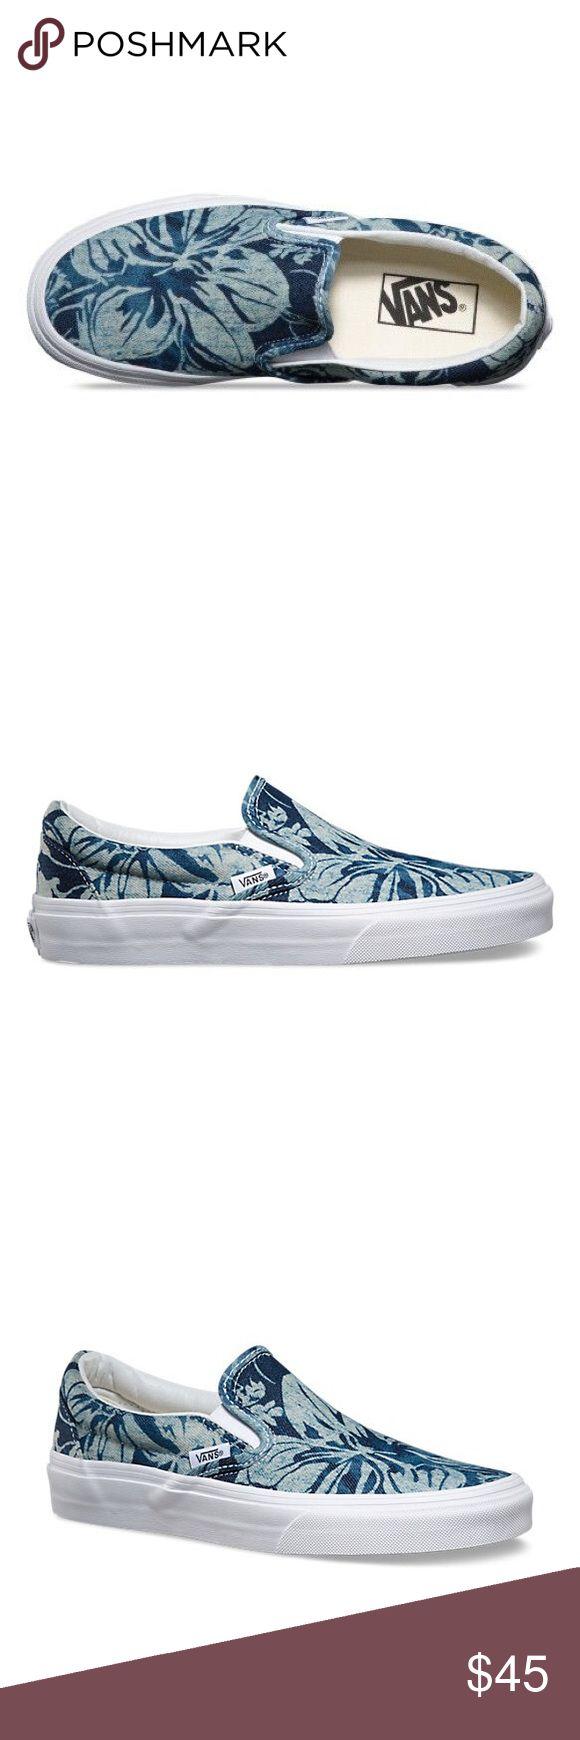 Indigo Tropical Slip-on Vans NWOT they're Super cute! (6.5 in Women's) Vans Shoes Sneakers